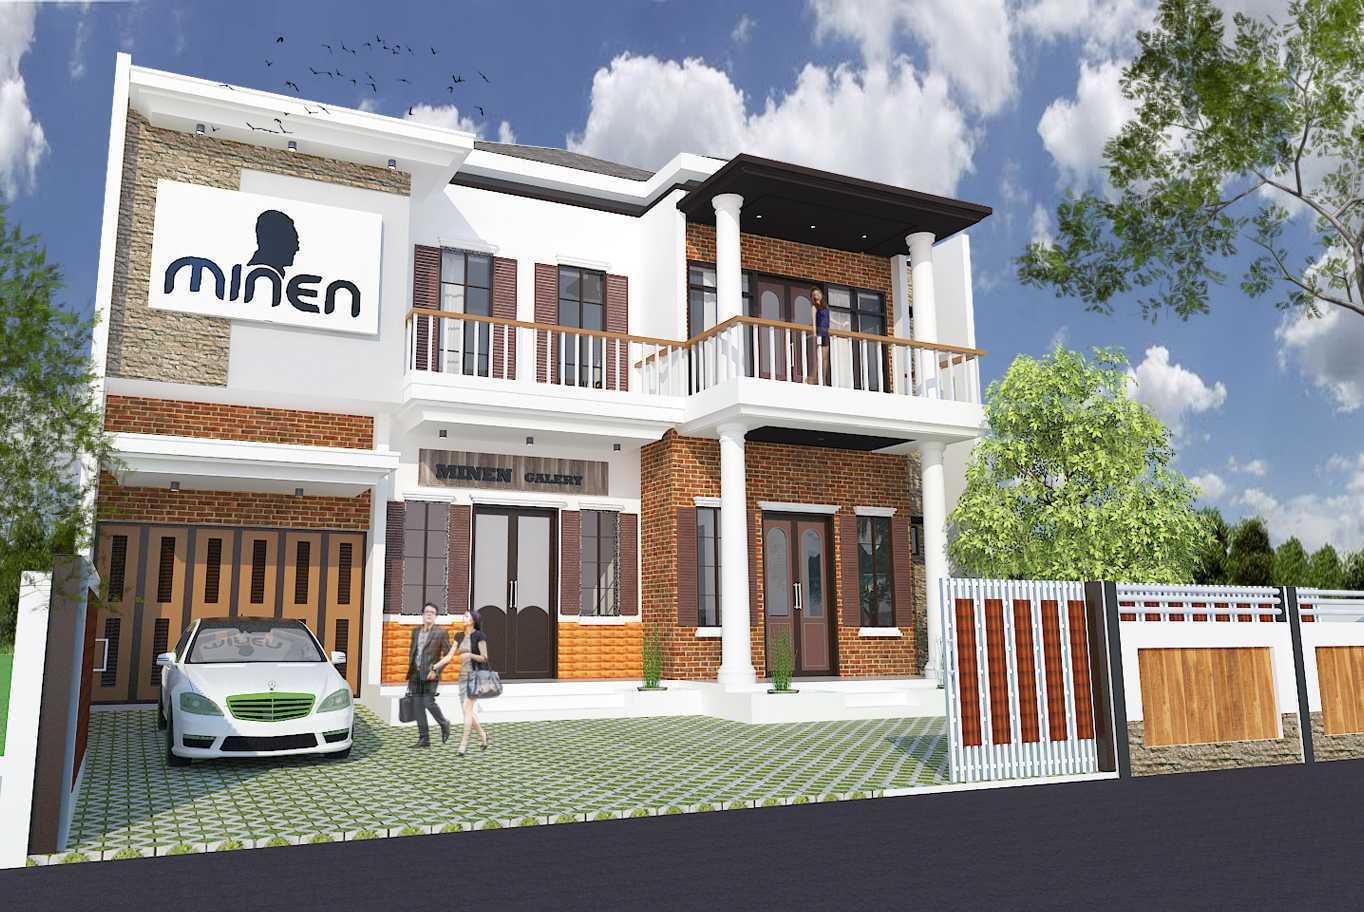 Archdesignbuild7 Rumah Tinggal 2 Lantai ( Minen )  Jl. Alfa Ii, Cigadung, Bandung Jl. Alfa Ii, Cigadung, Bandung Fasade-Baru-3 Minimalis  20788